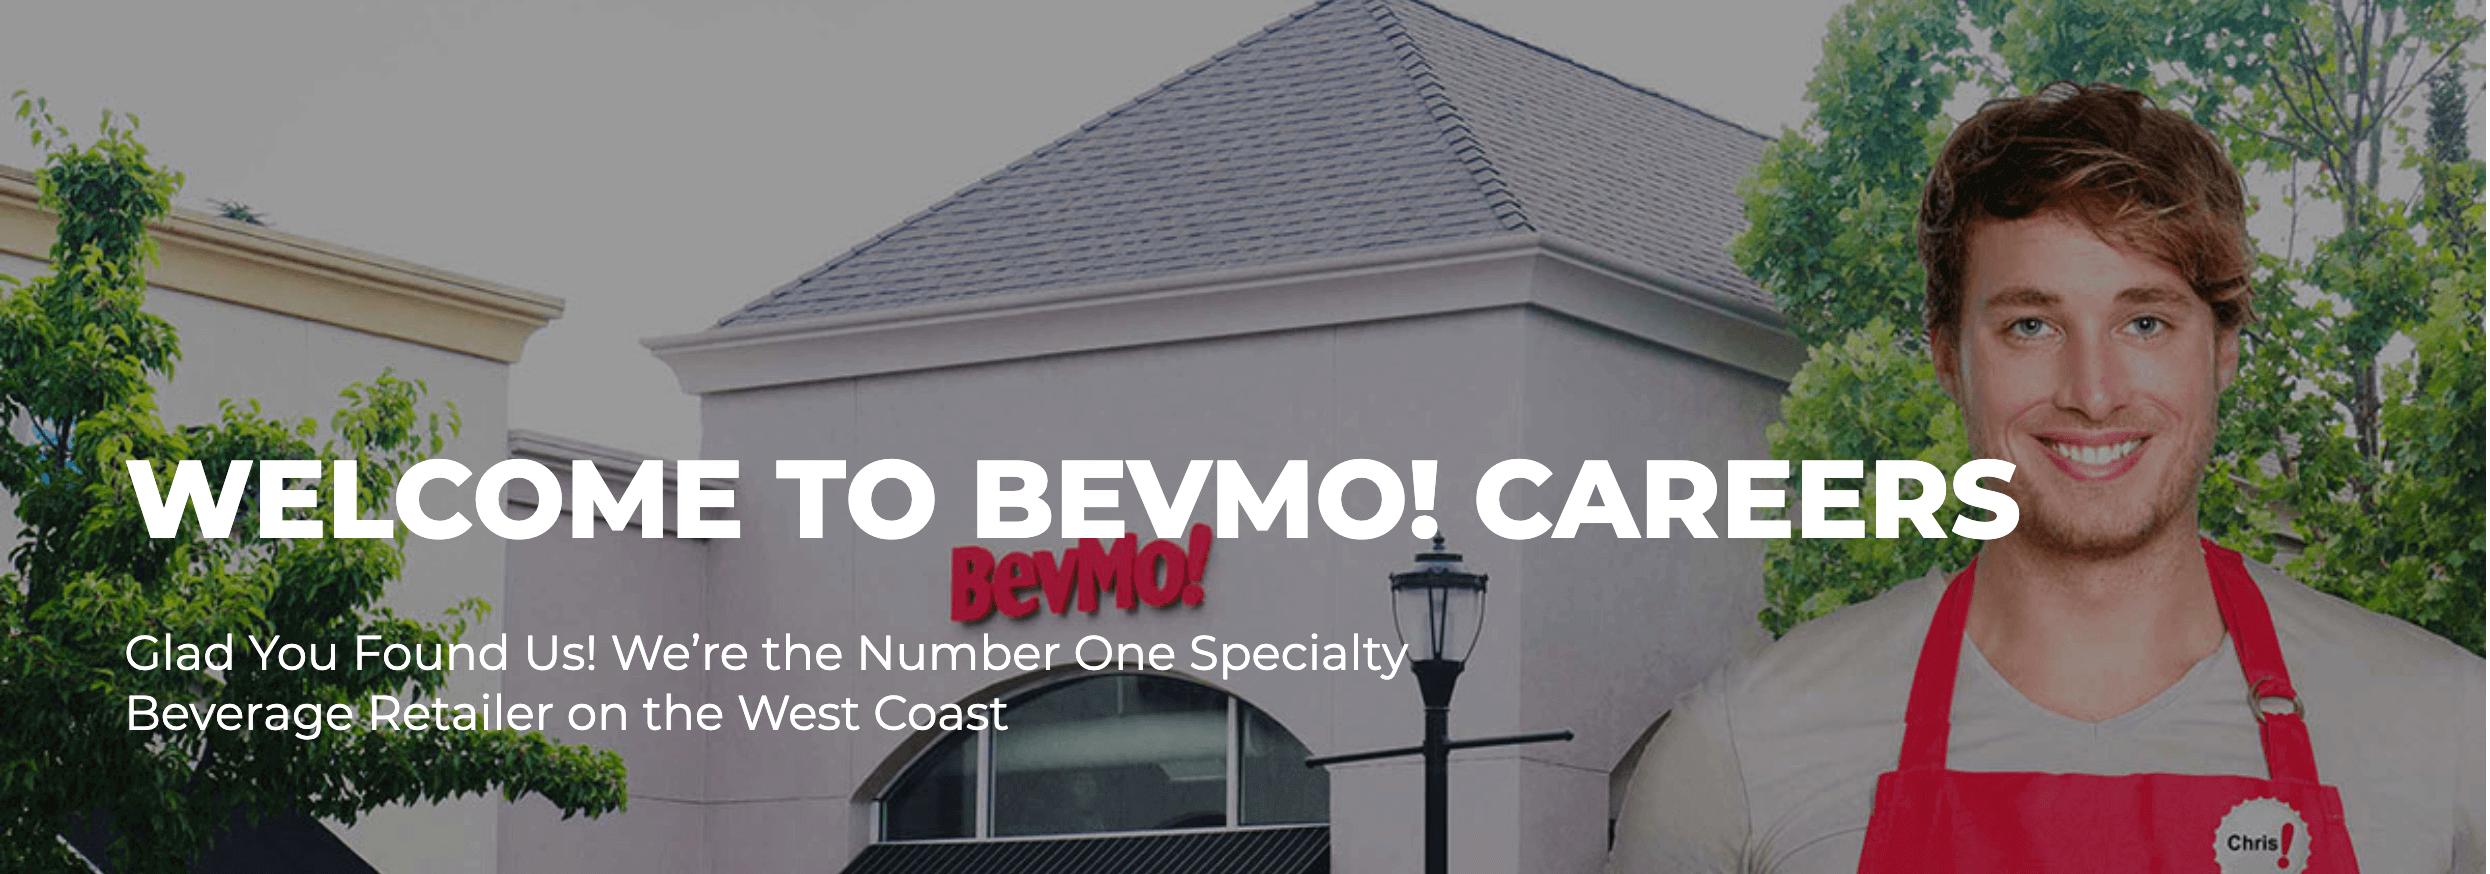 WELCOME TO BEVMO! CAREERS